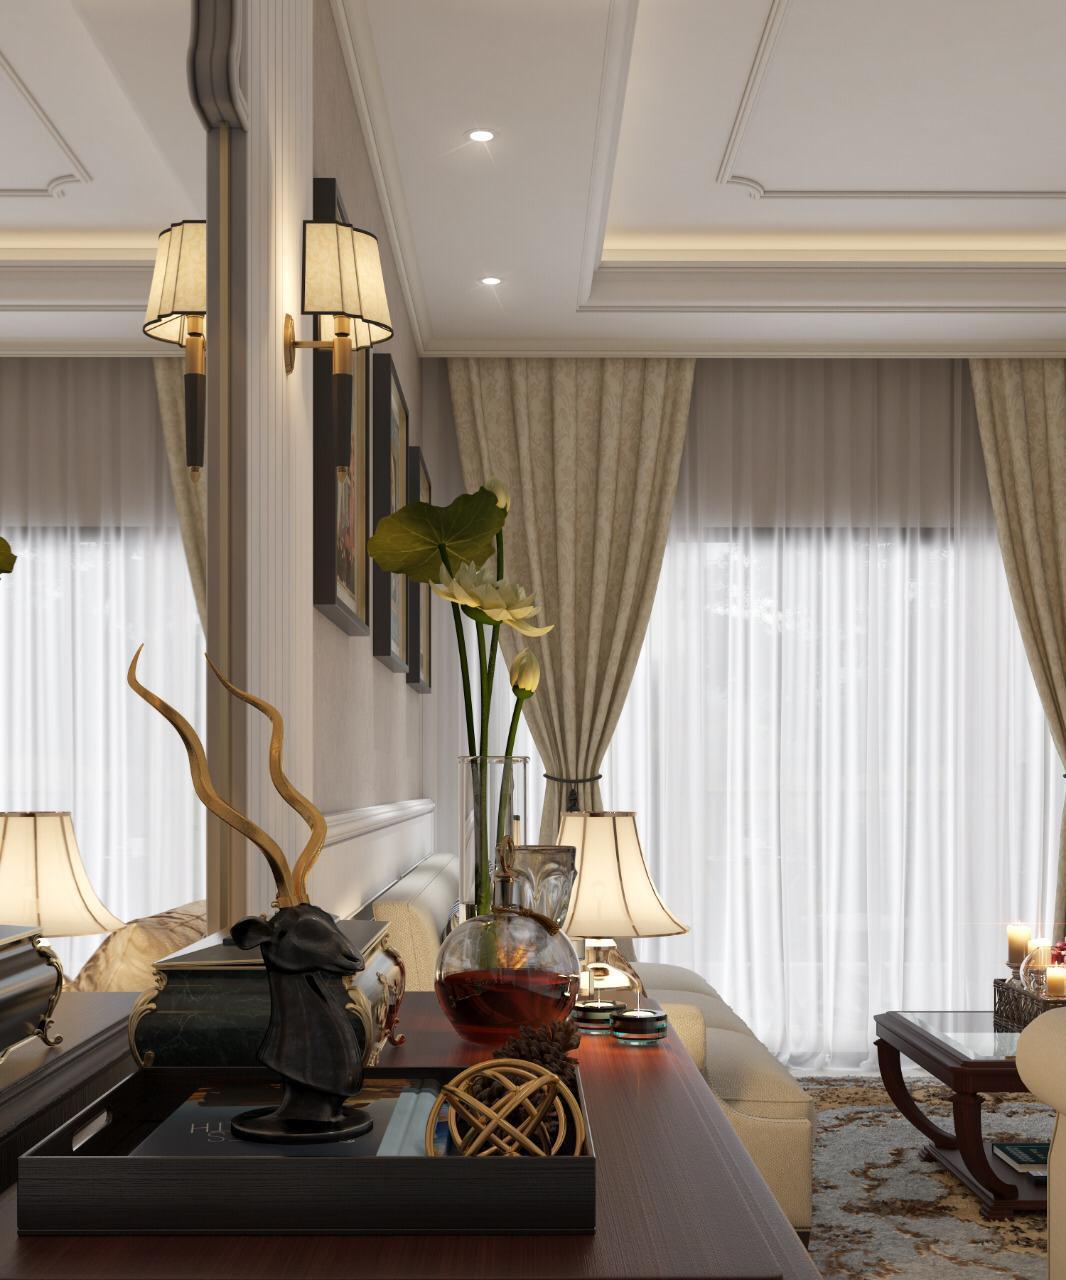 Sobha Royal Pavilion Apartments | Luxuryproperties.in